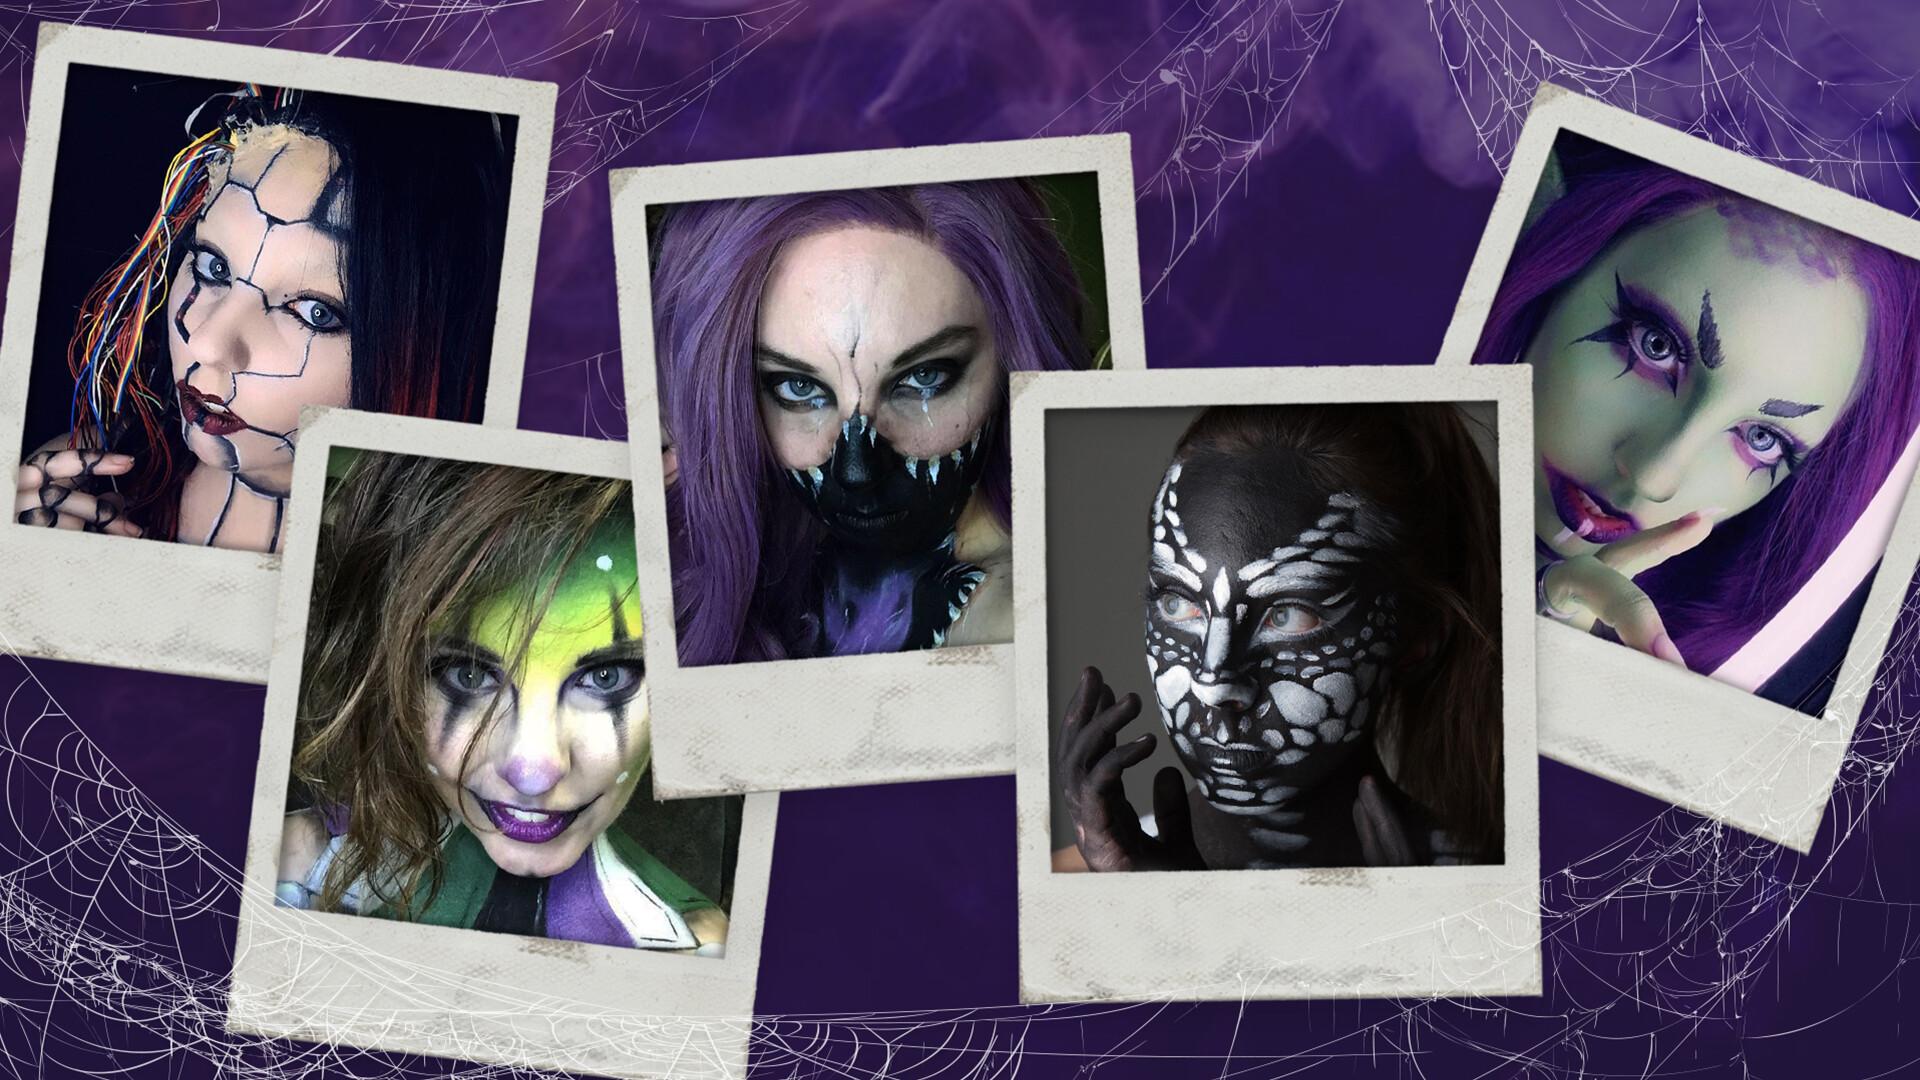 Husker creates Halloween looks as special effects makeup artist